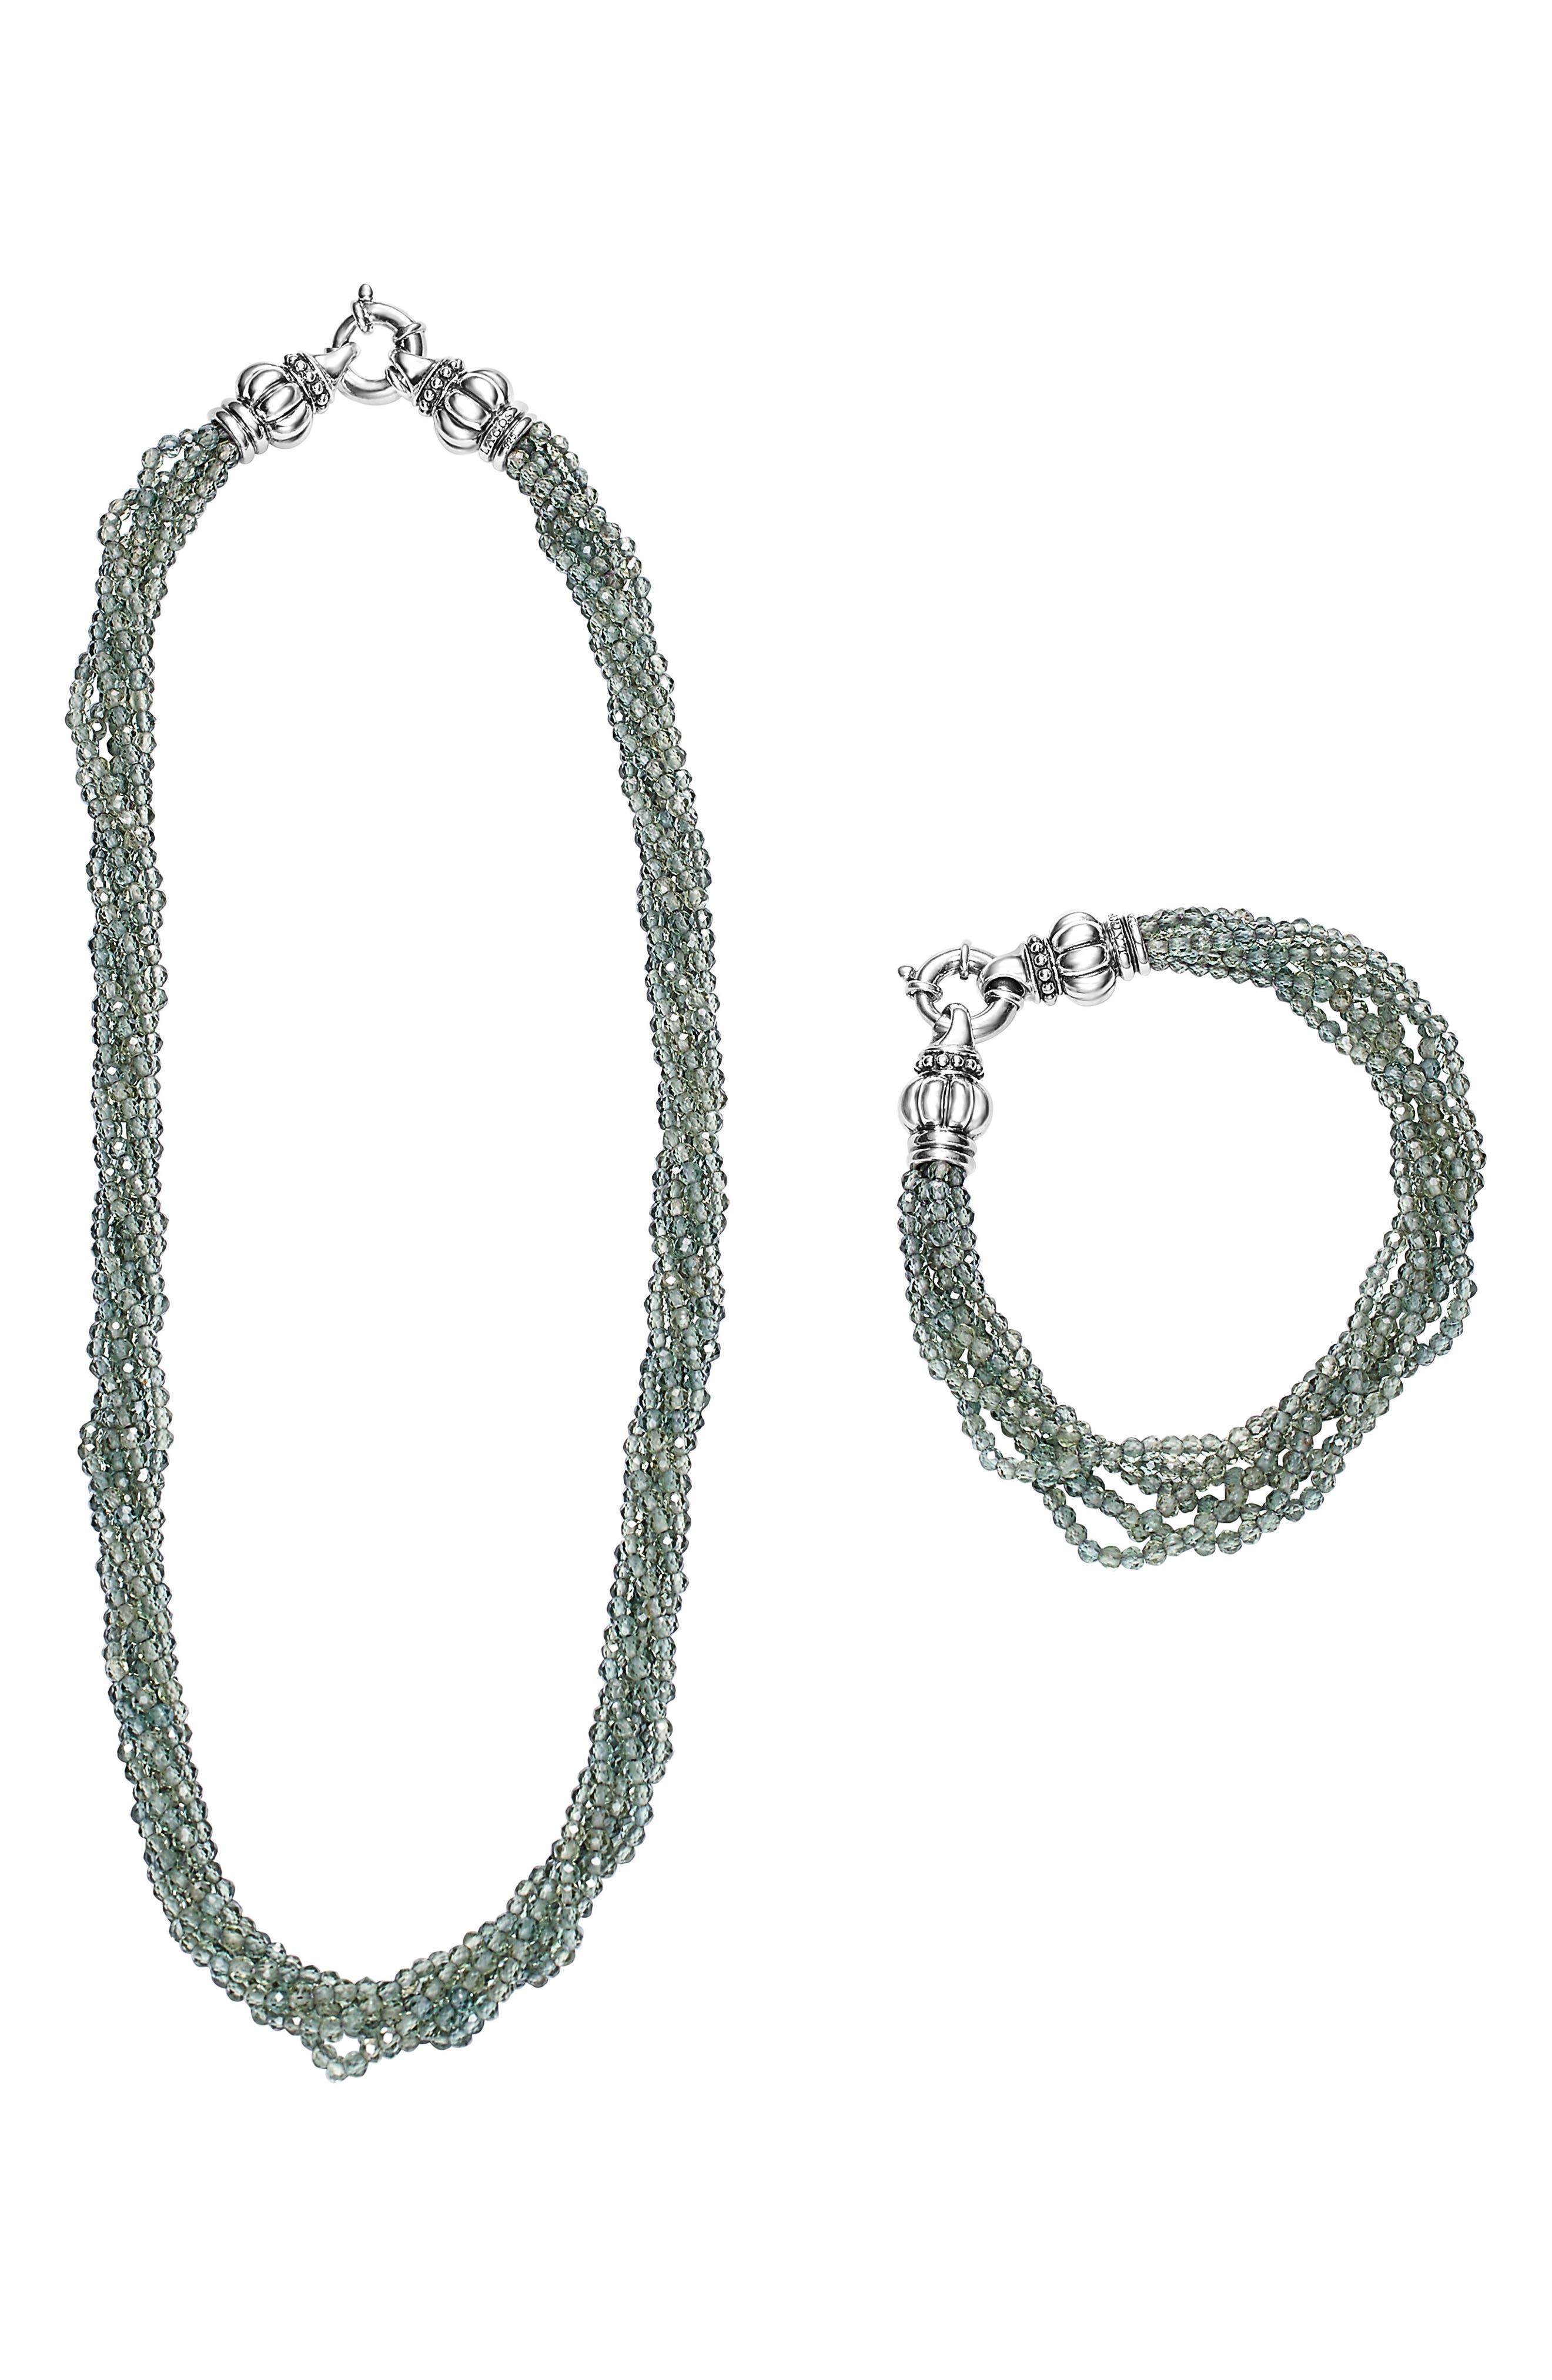 Caviar Icon Bead Convertible Bracelet & Necklace,                             Alternate thumbnail 3, color,                             040